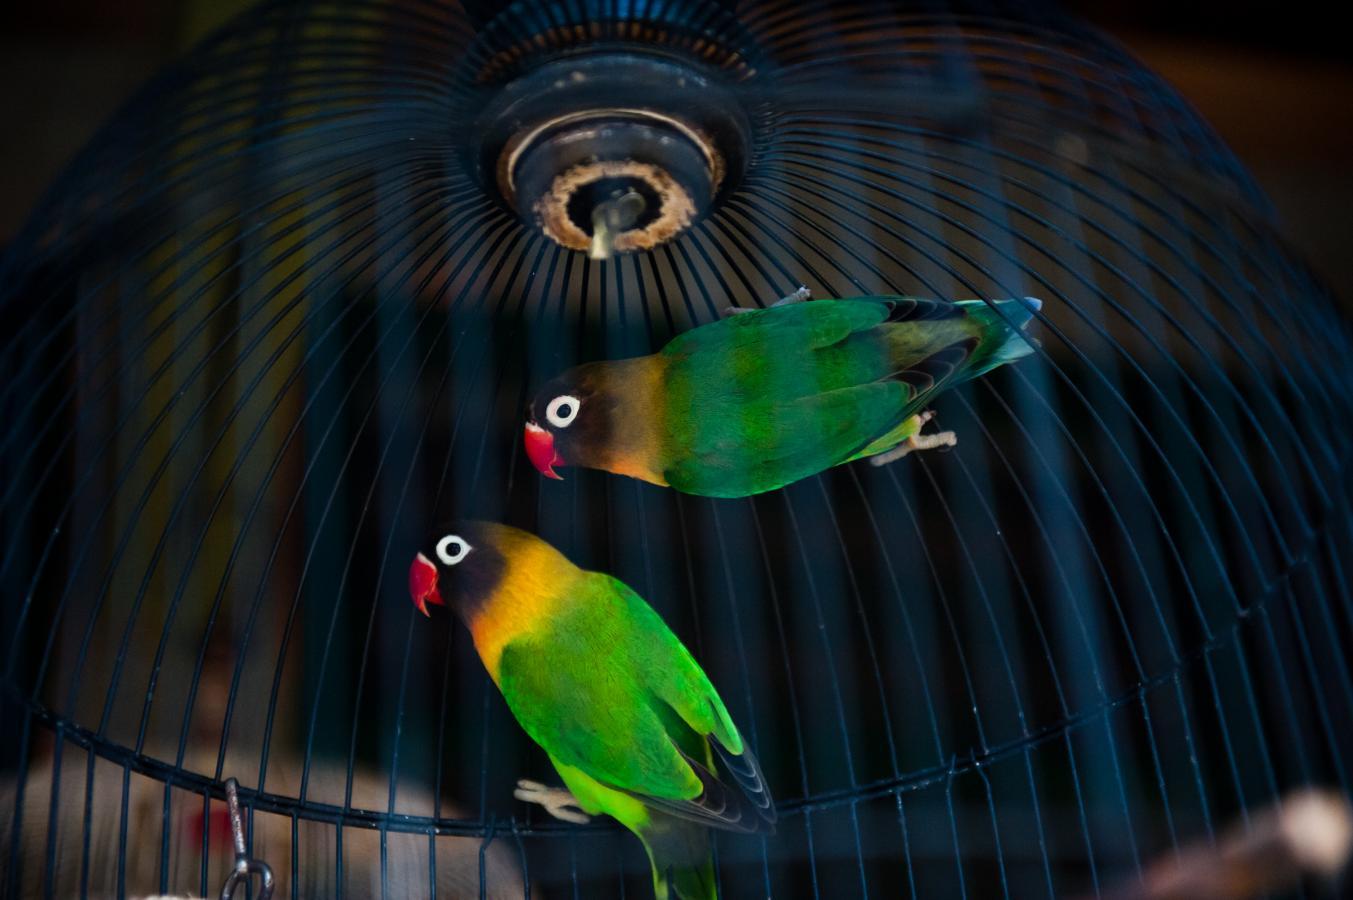 bird-market-in-yogyakarta-java-2010